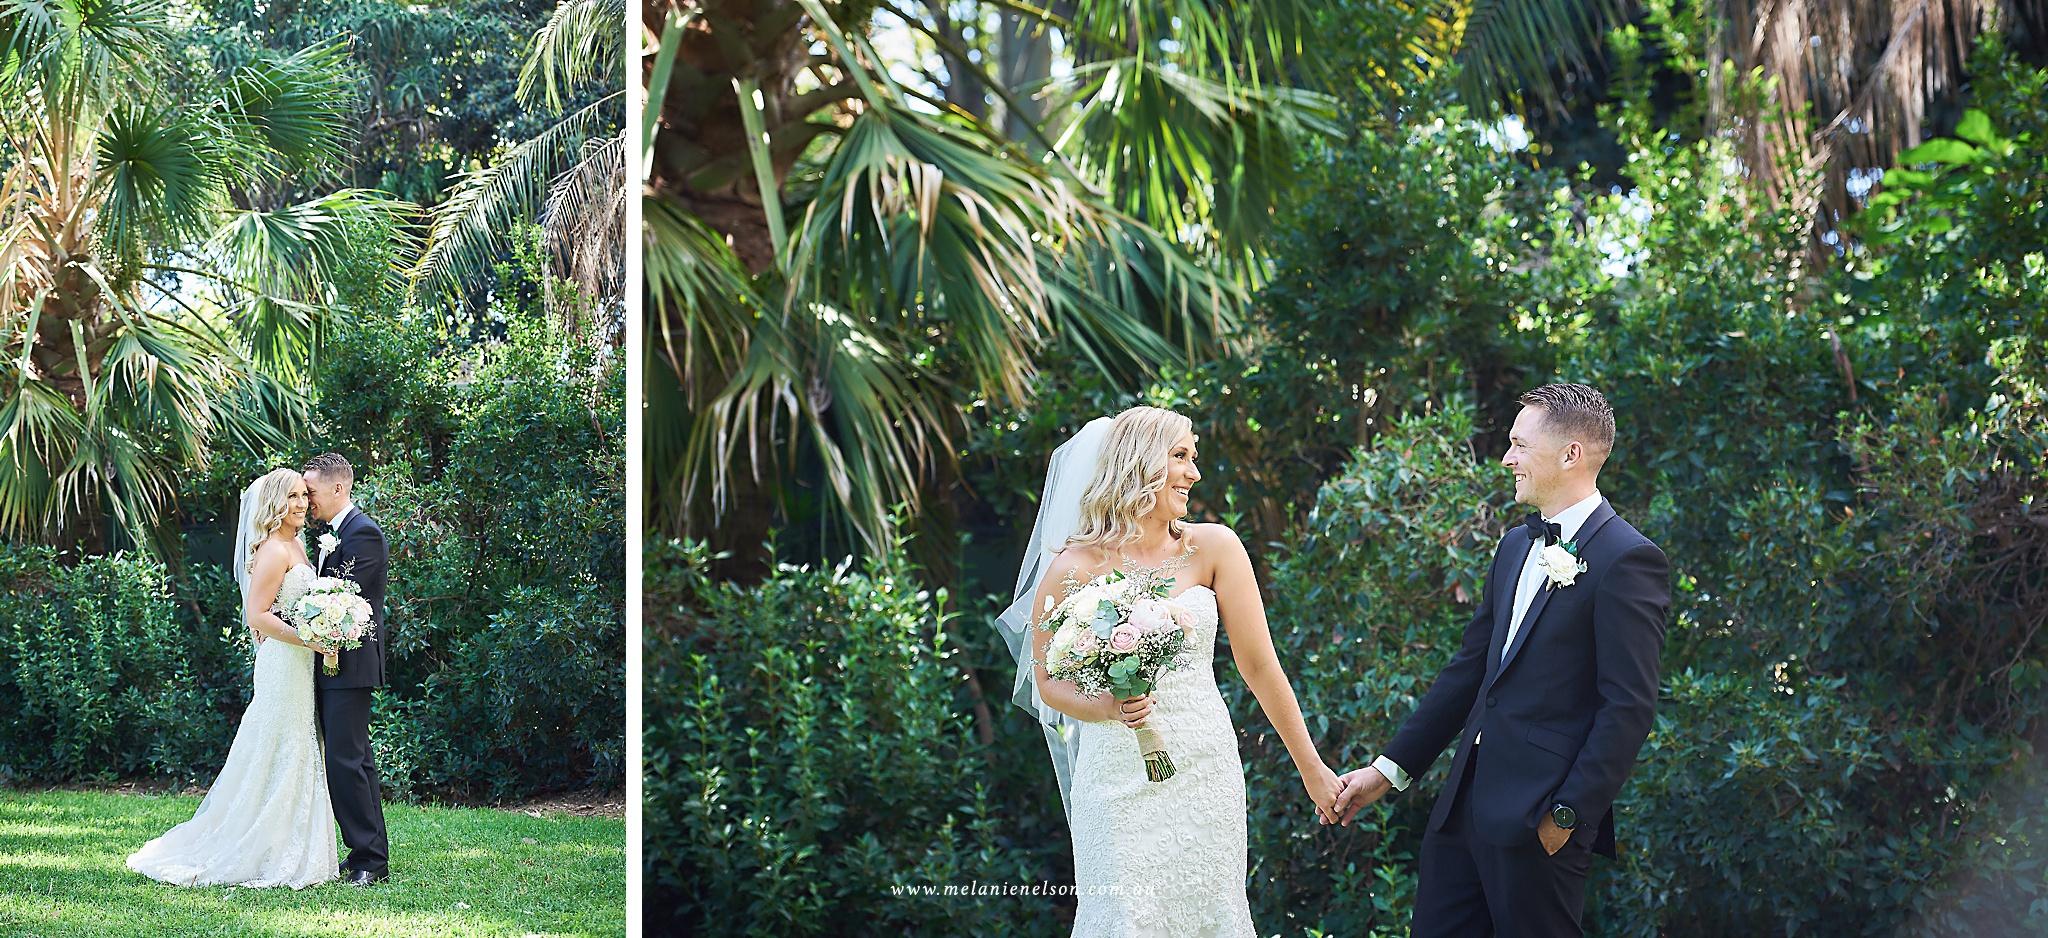 adelaide_botanic_gardens_wedding_0036.jpg